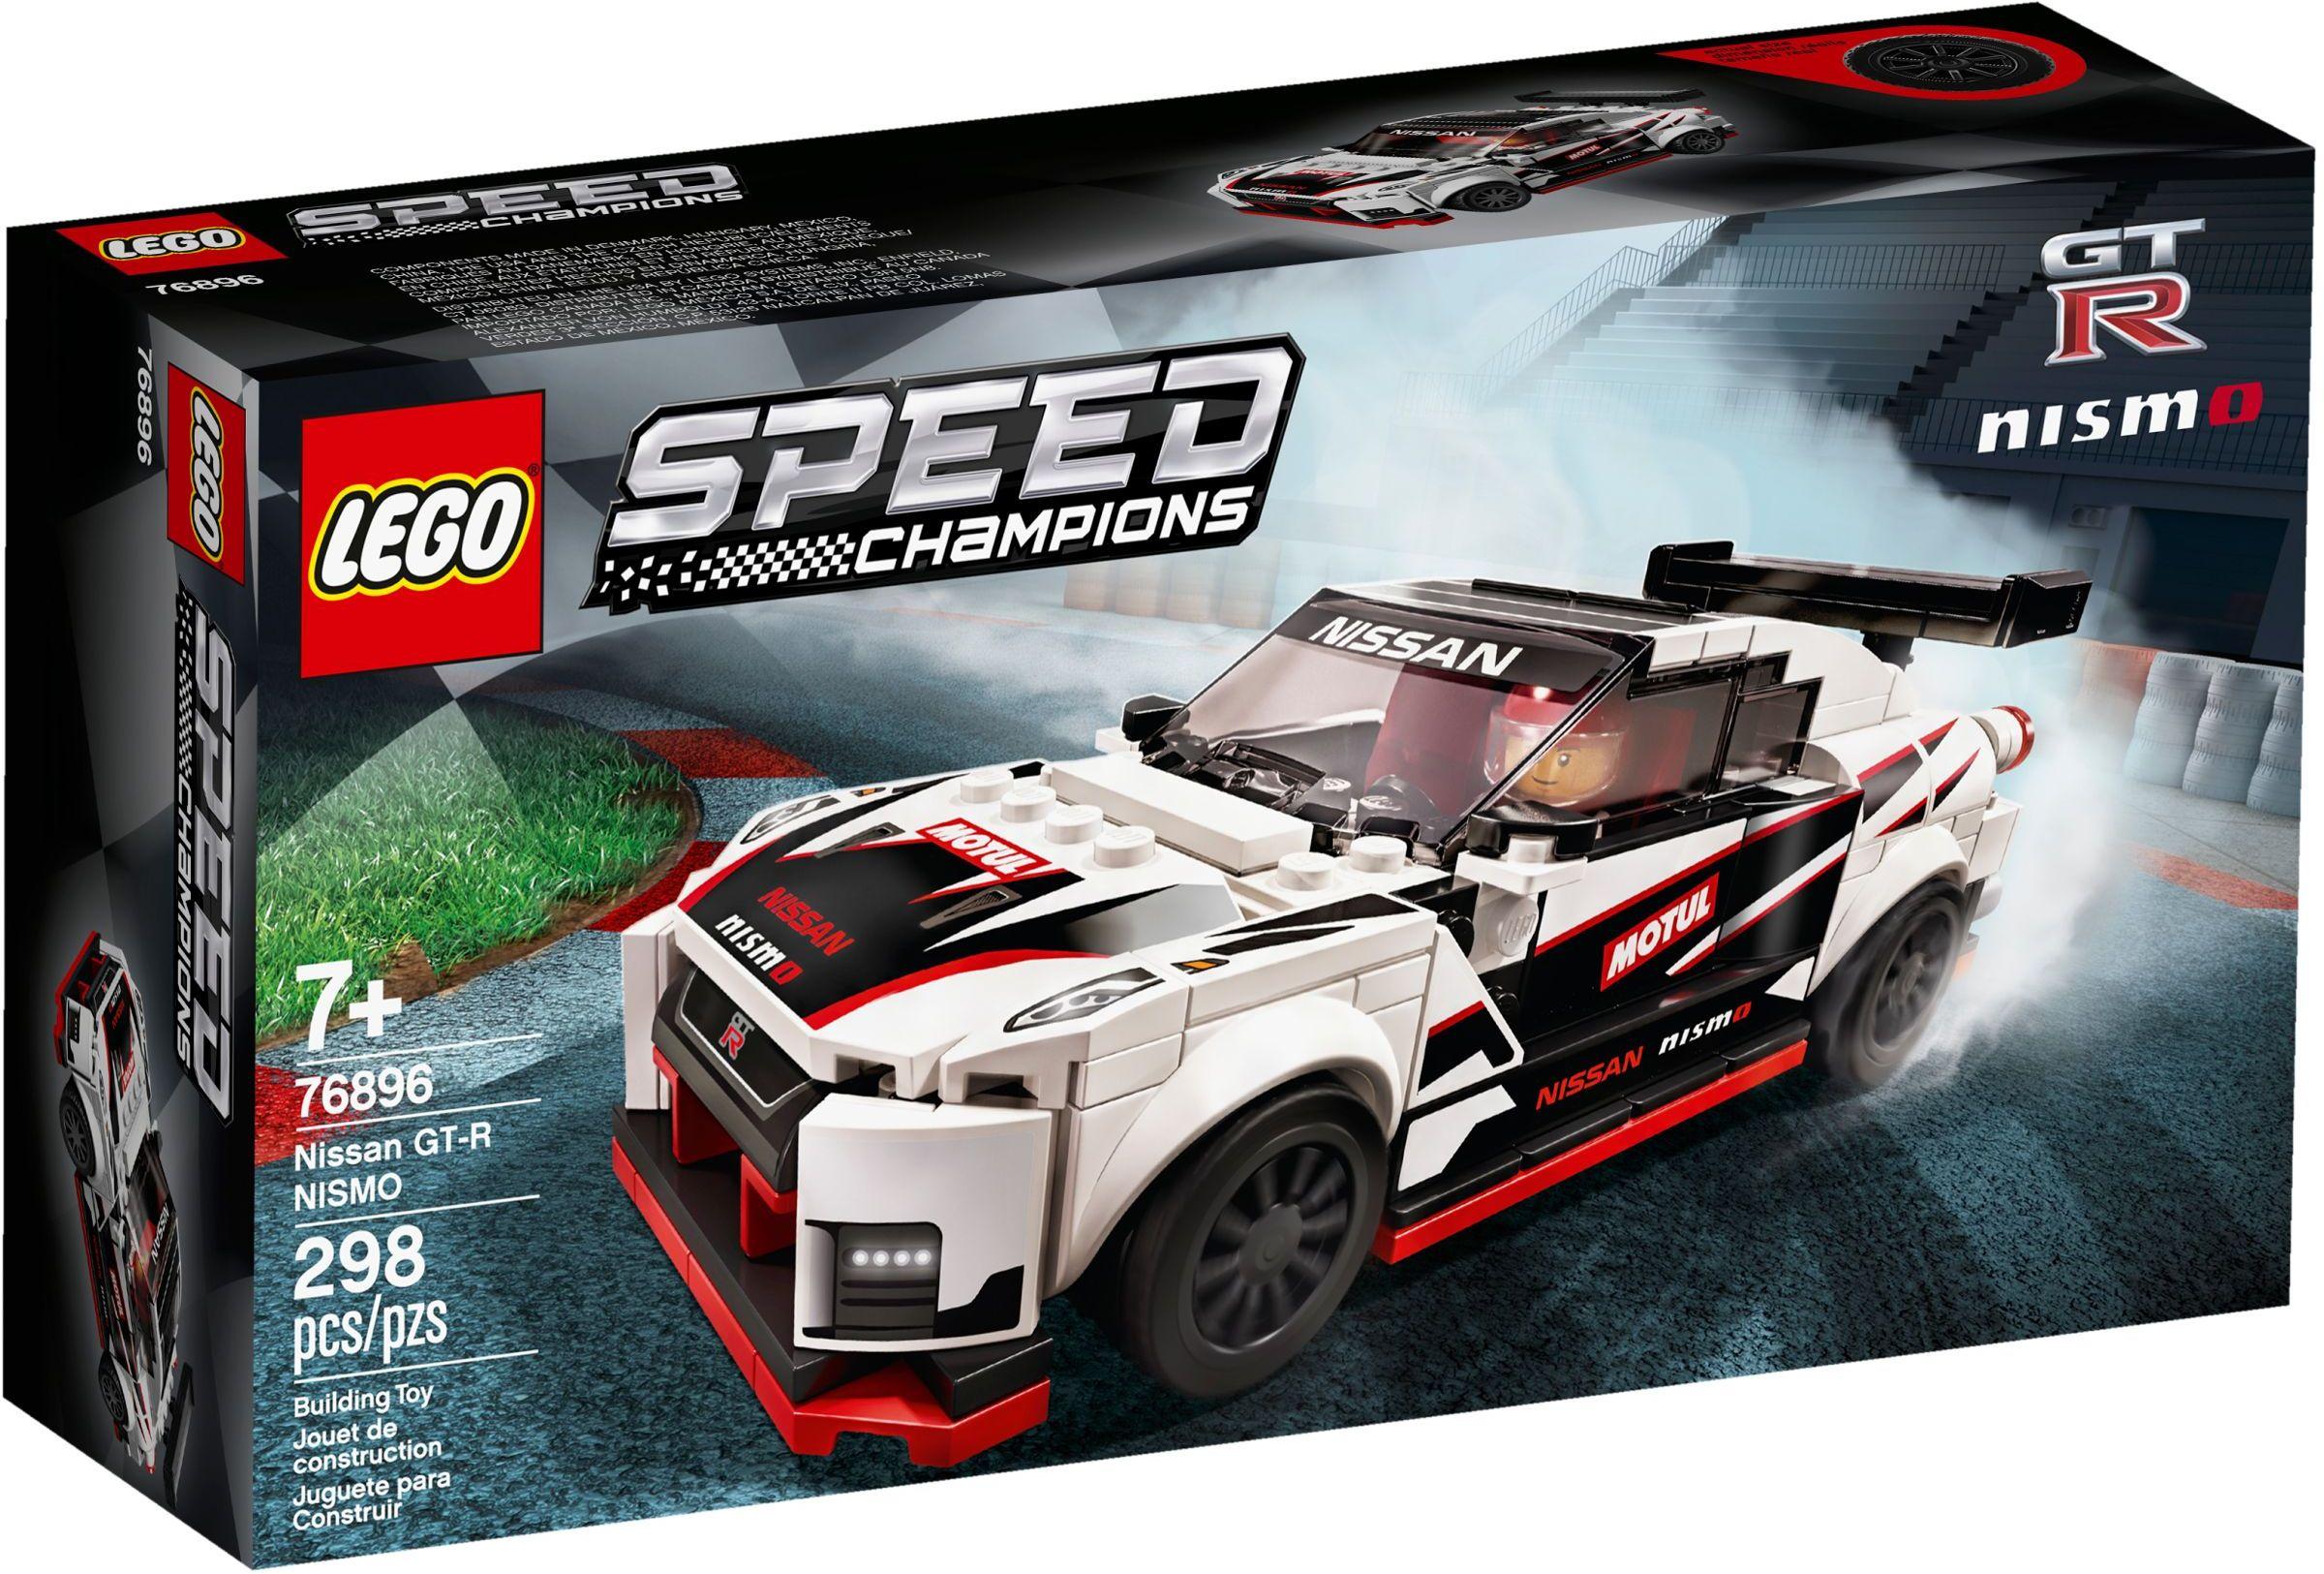 76896 LEGO Nissan GT-R NISMO - Xe đua Nissan GT-R NISMO